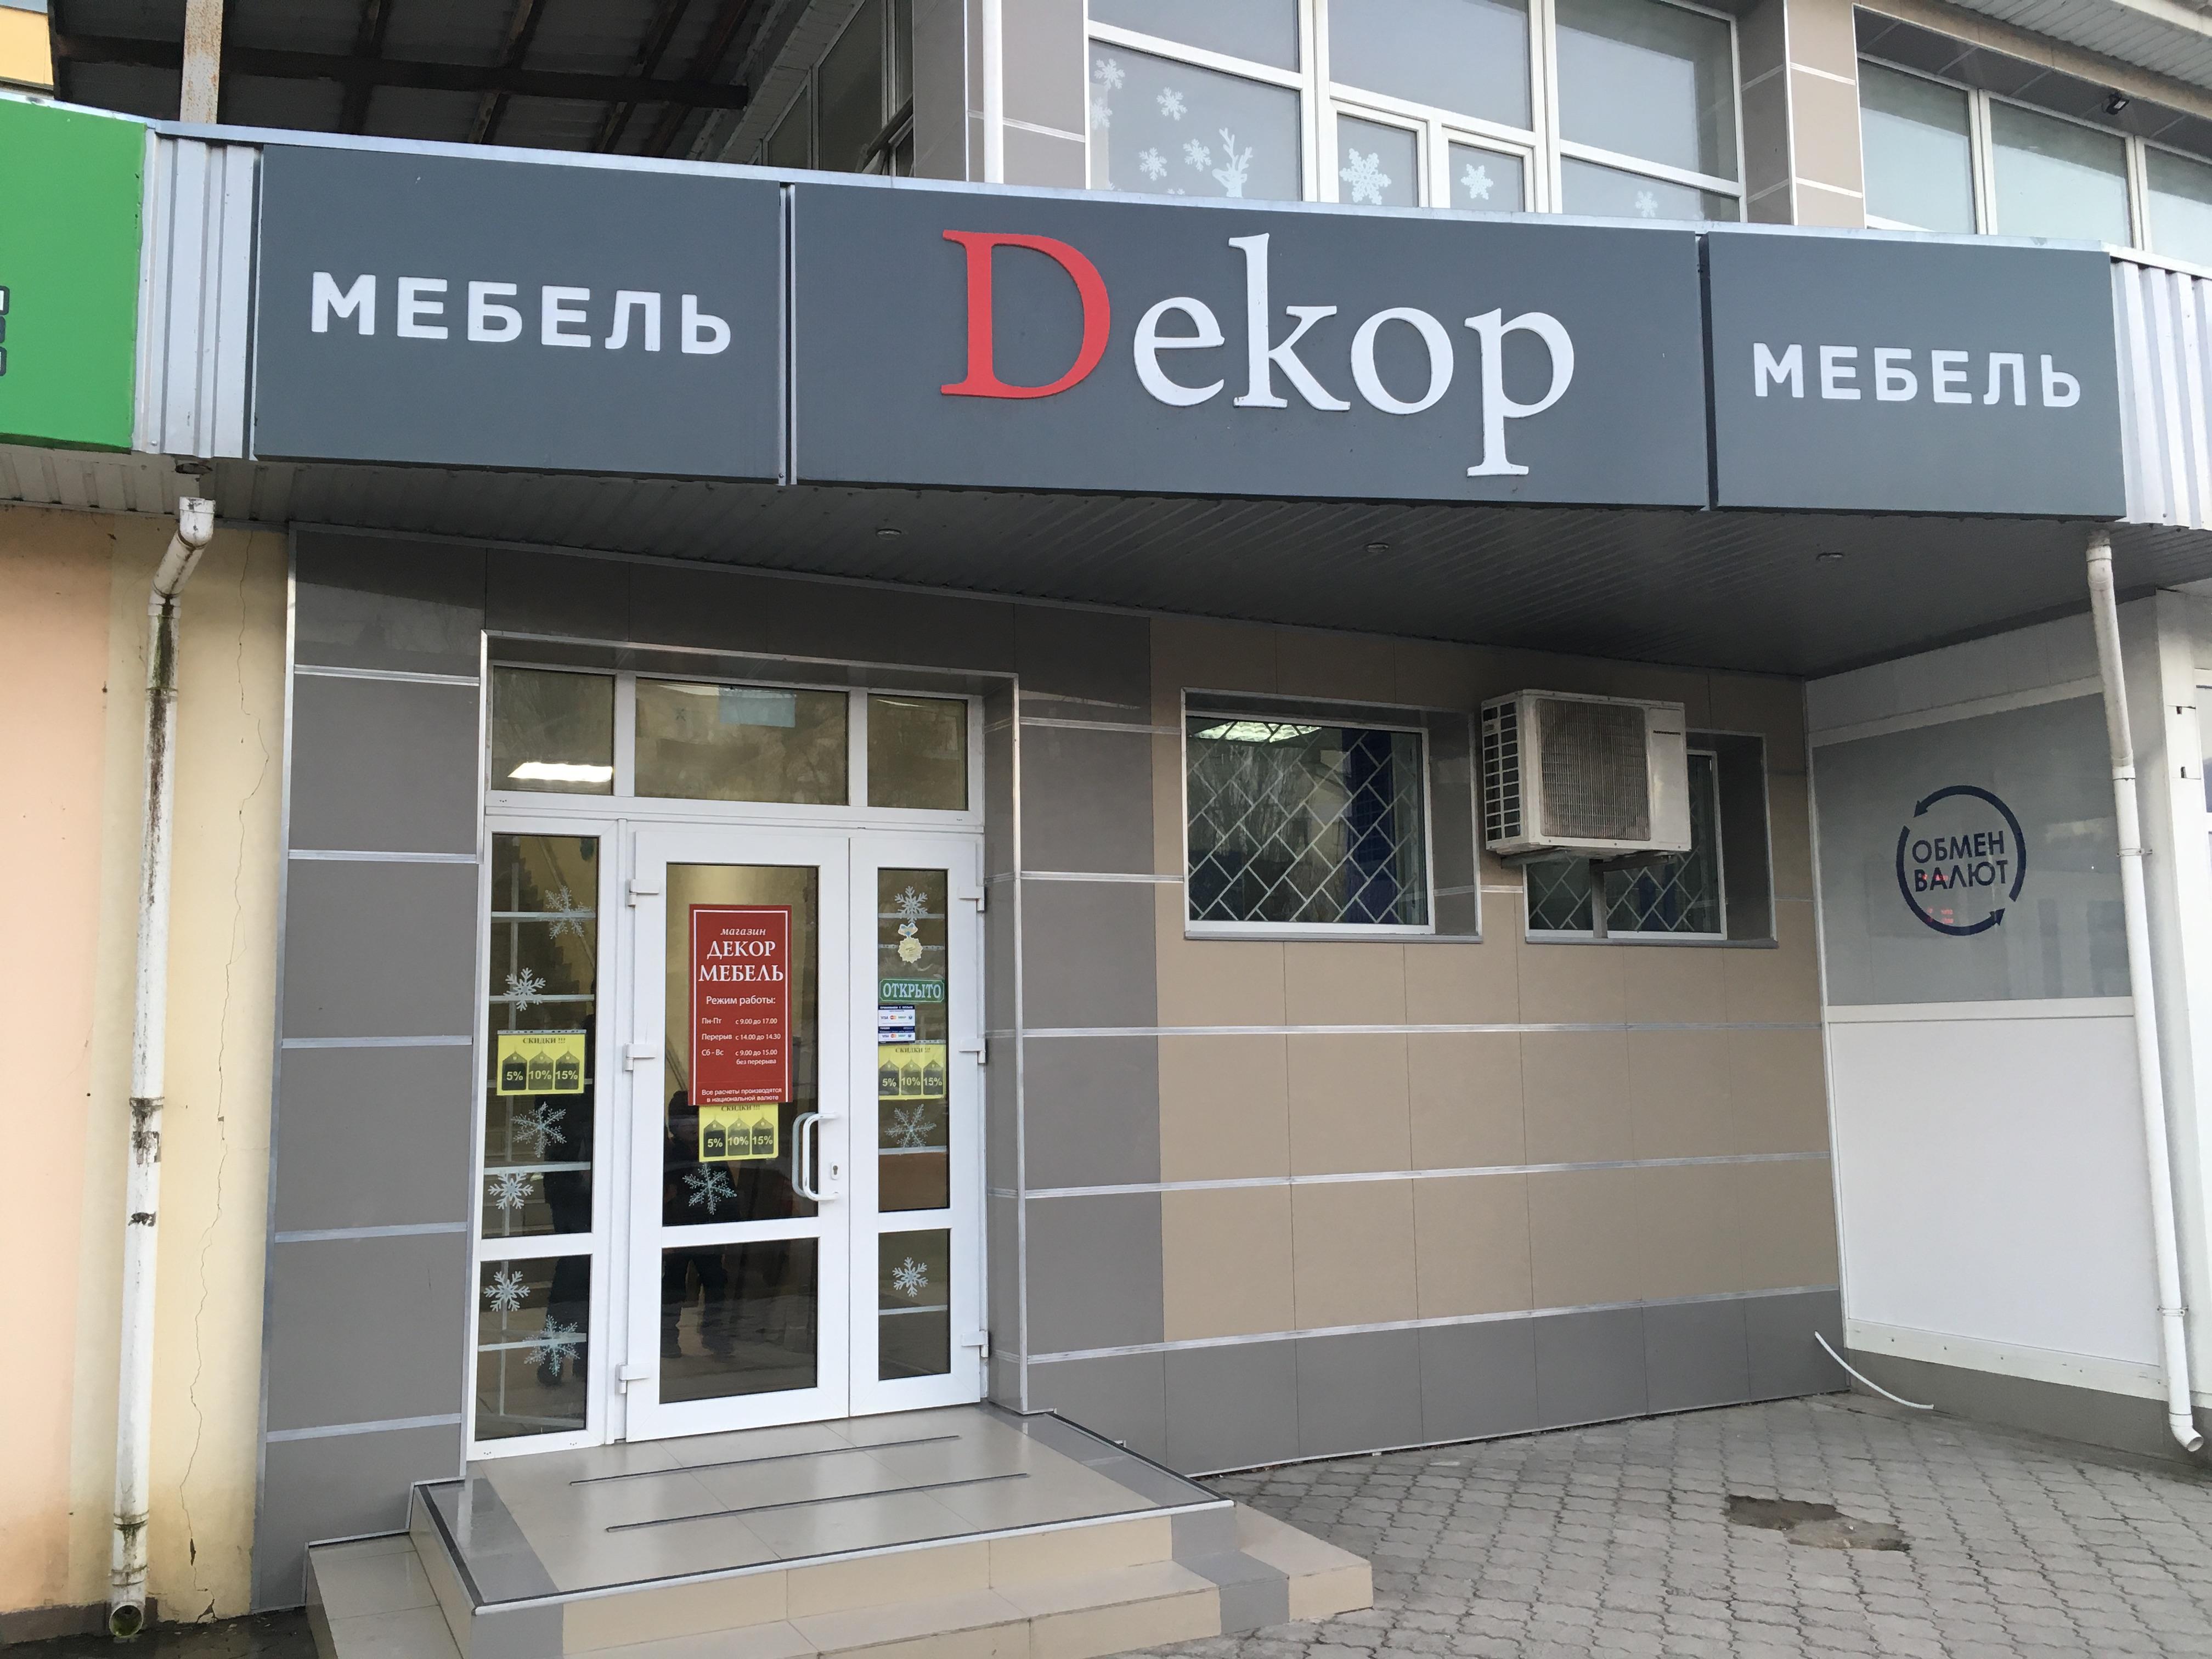 Фирма: Магазин Декор